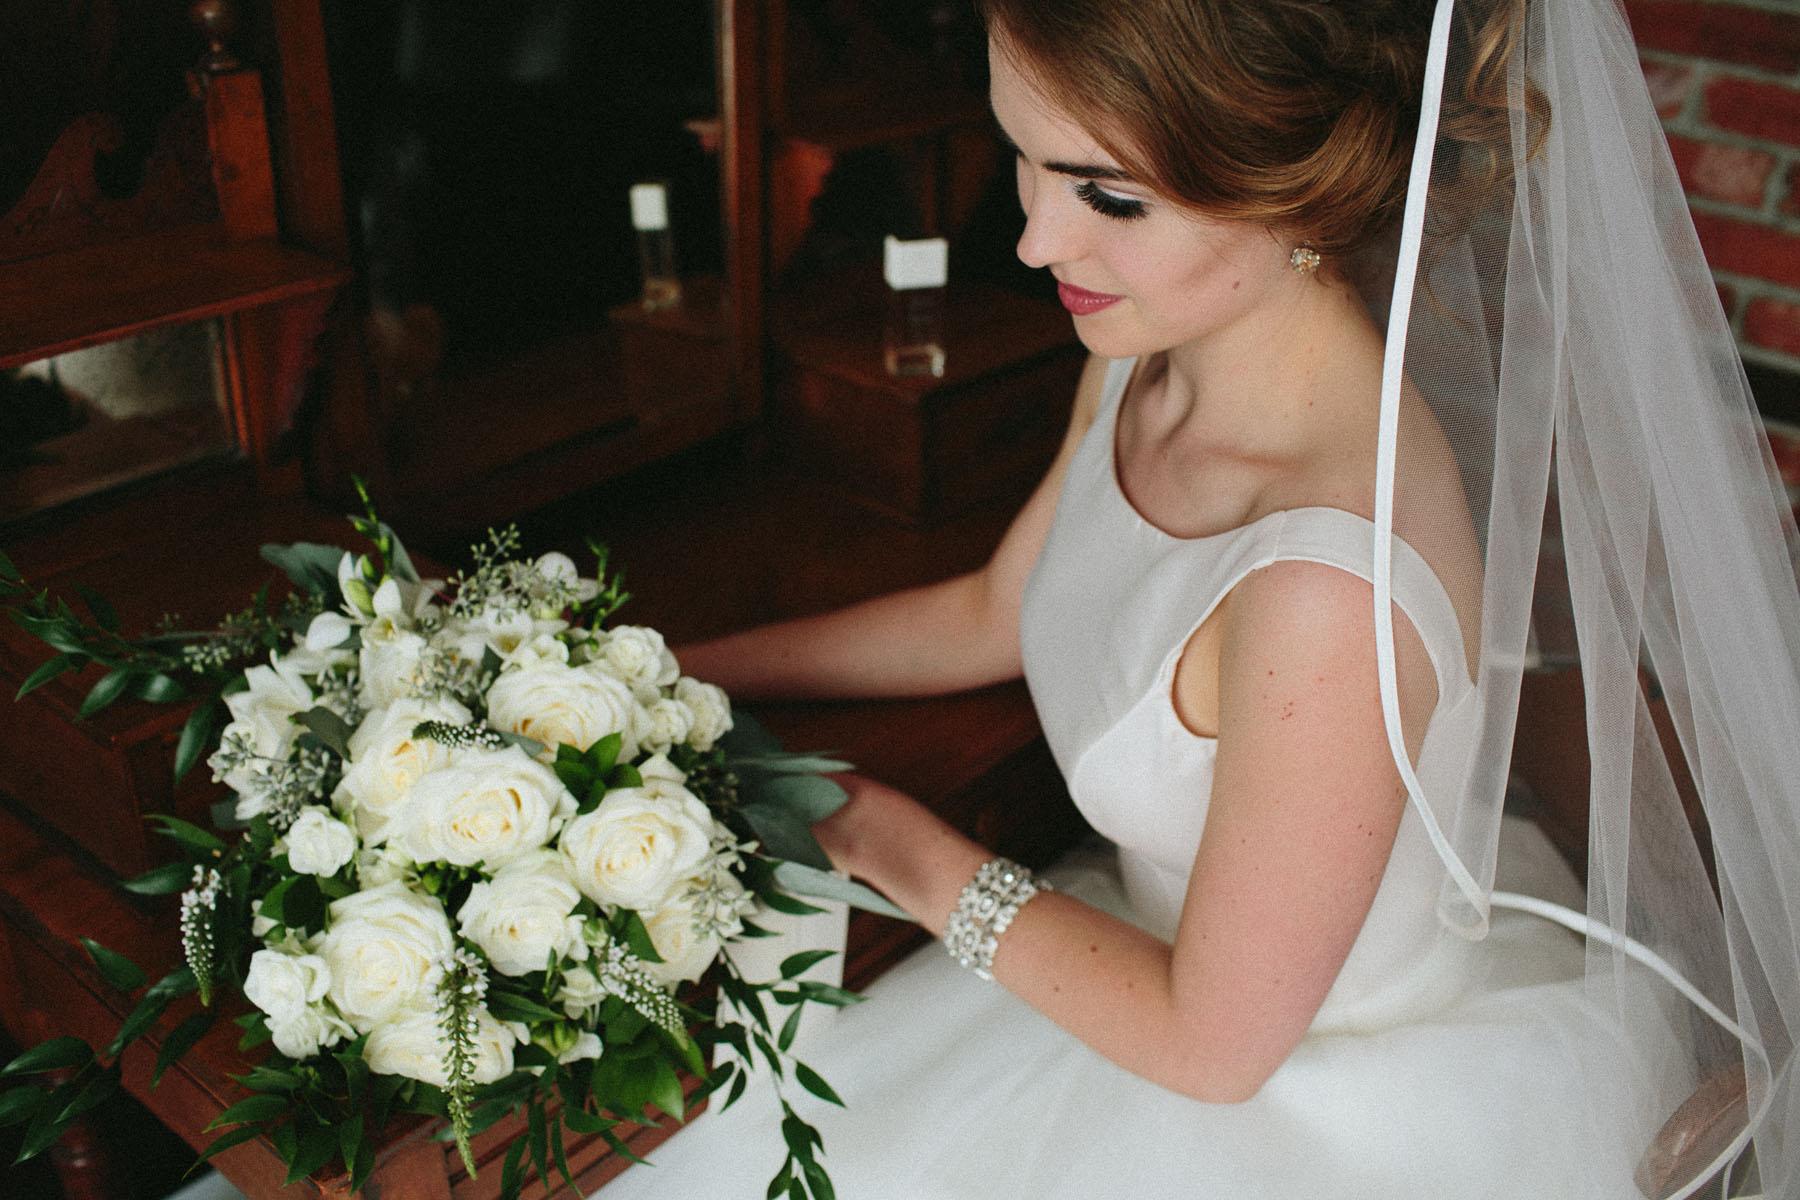 thetis-island-wedding-photographer-rp-rn-057.jpg